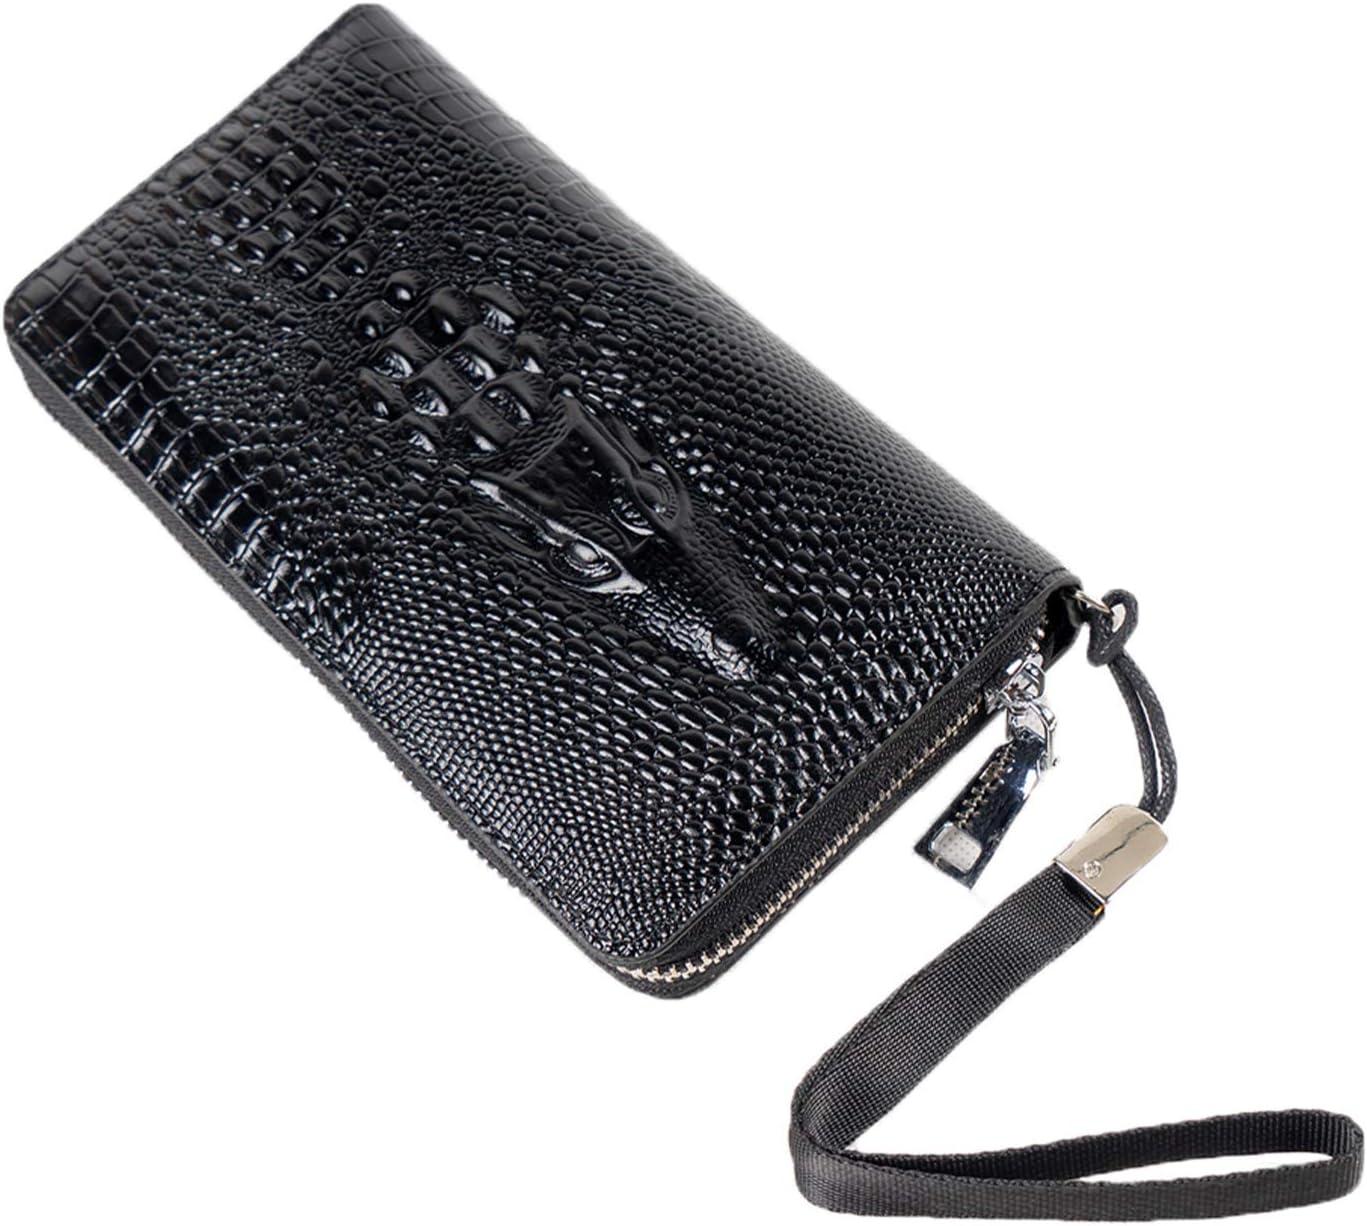 MINGLIN Women Crocodile Pattern Wallet Bifold Clutch Large Capacity Card RFID Blocking Wallet Organizer Buckle Long Purse for Girls, Black